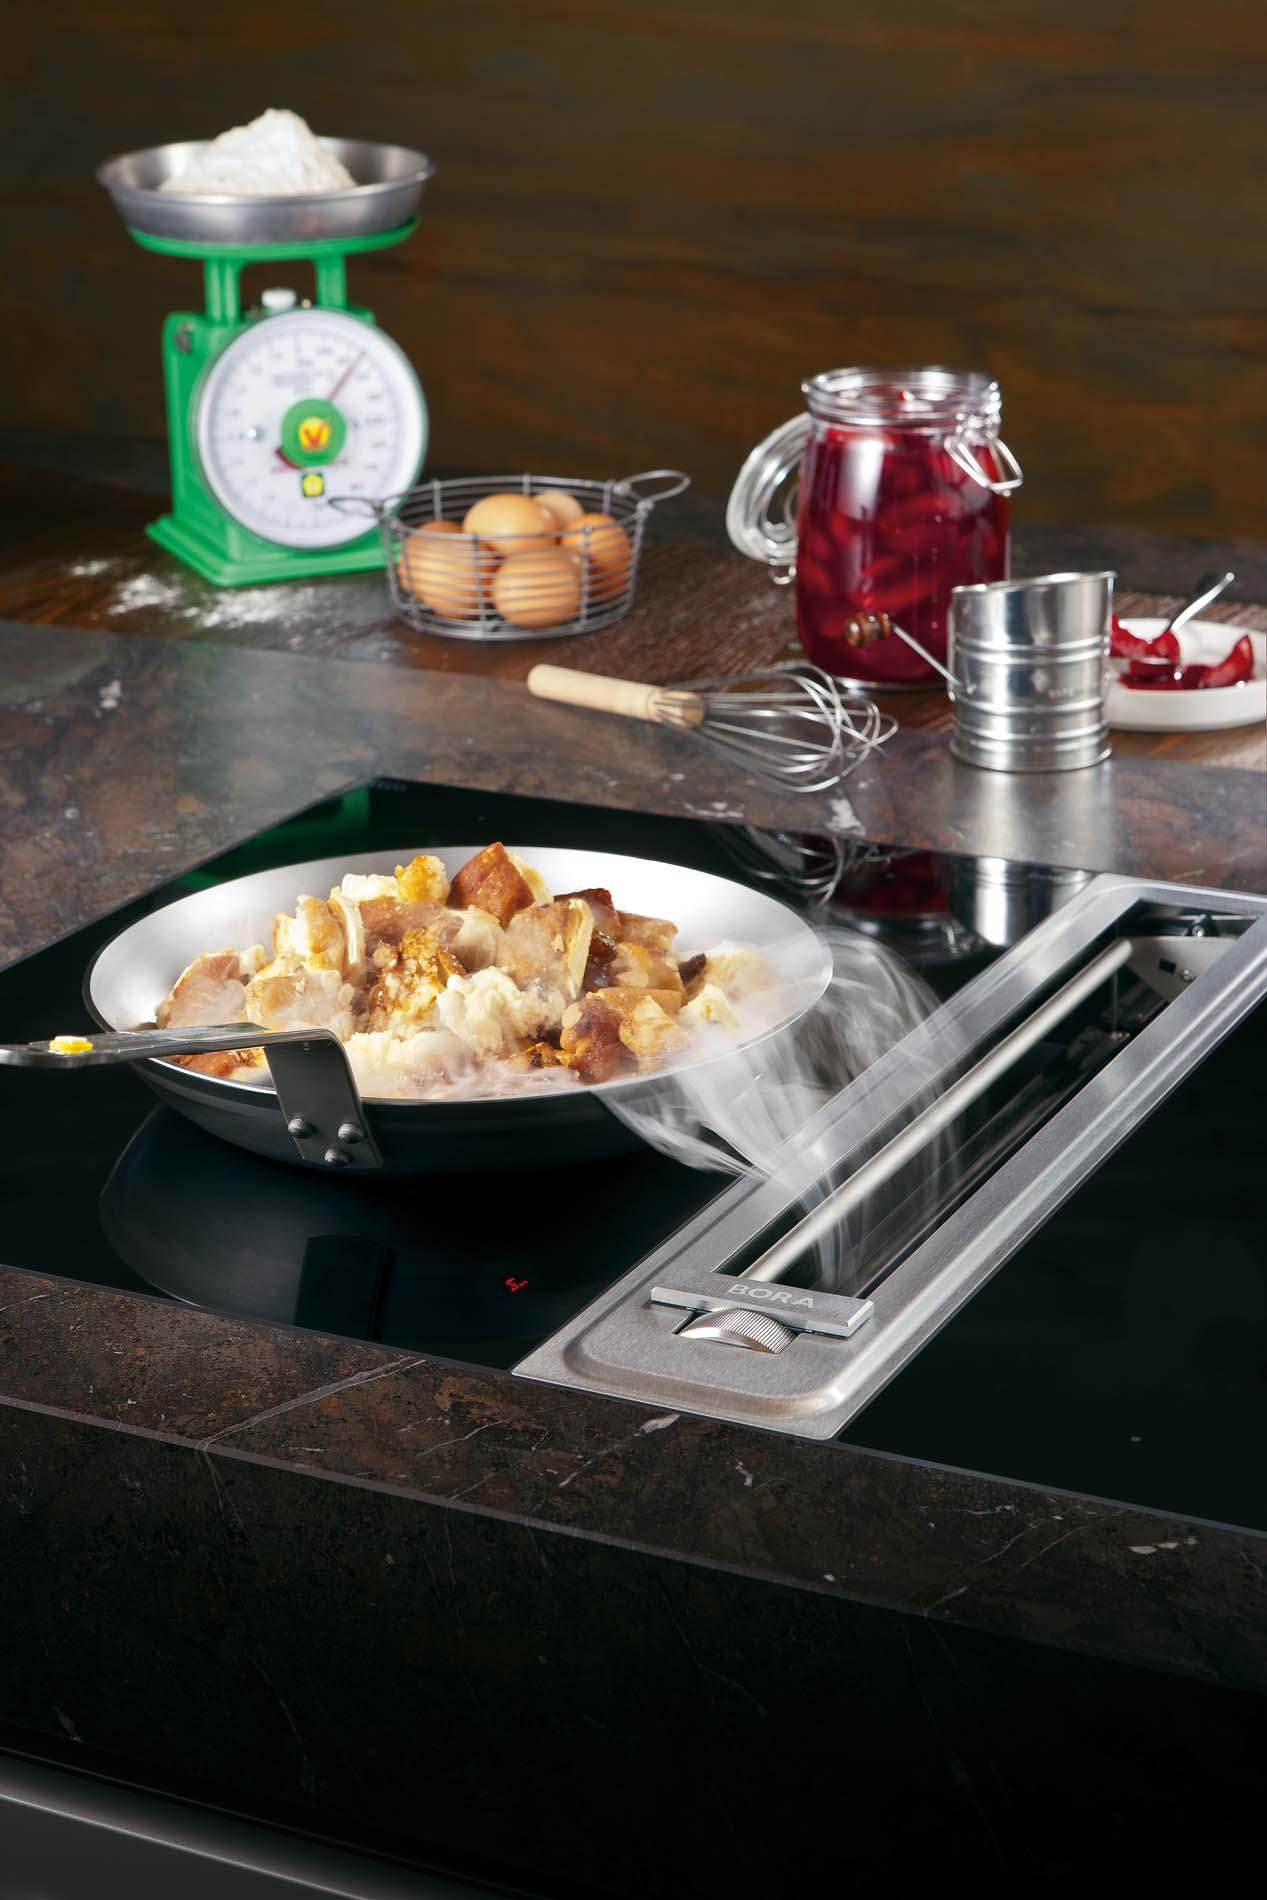 Keuken Afzuigkap Capaciteit : De juiste afzuigkap, hoe kiest u deze? – ASWA Keukens